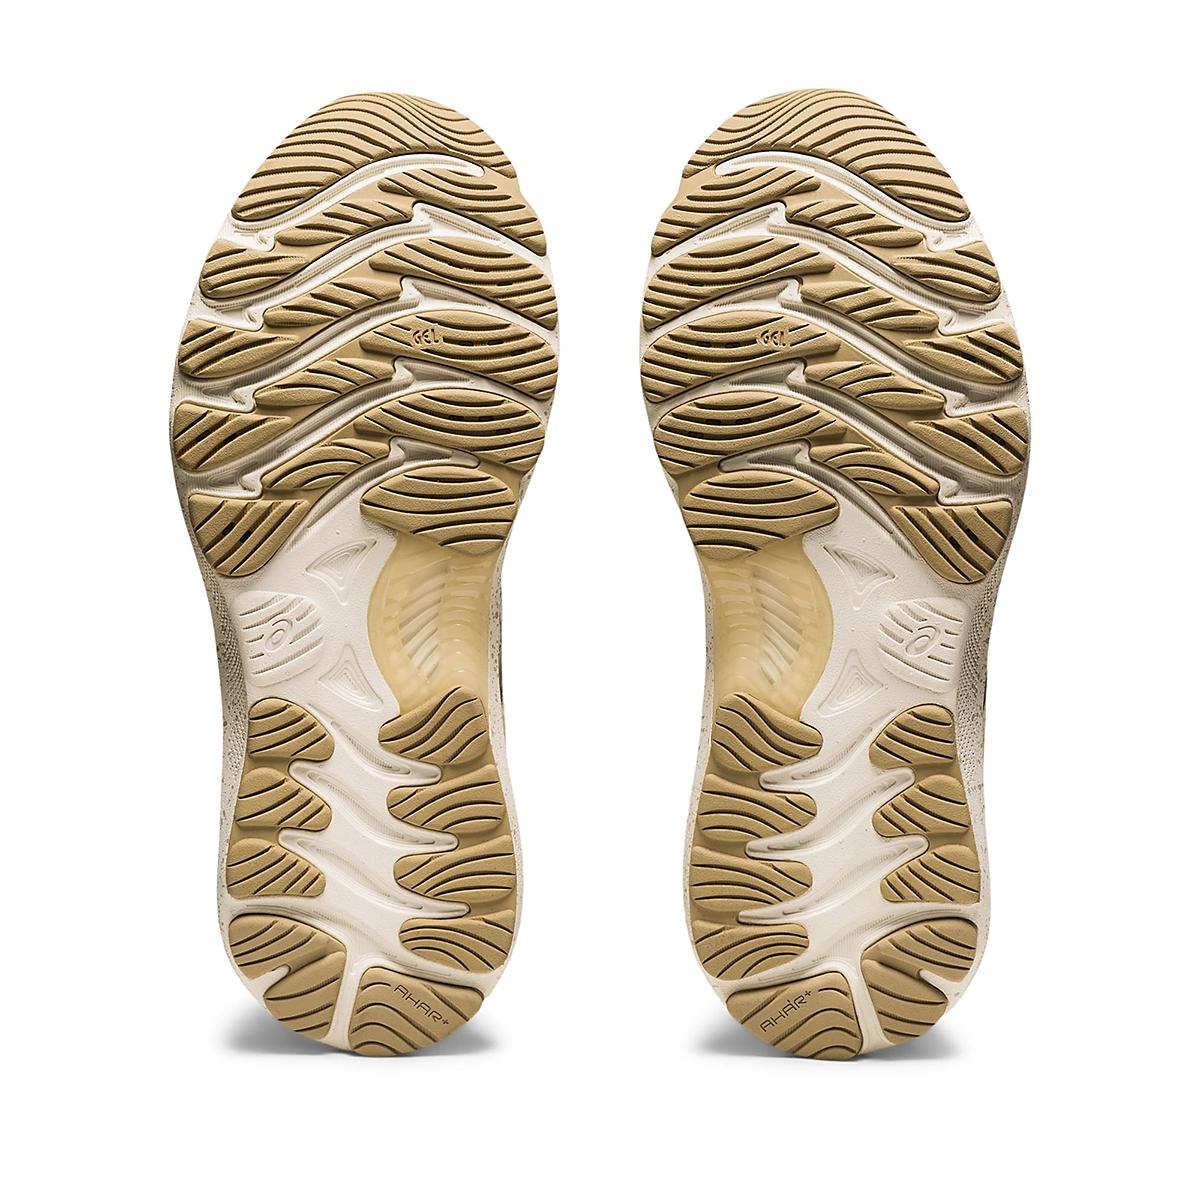 Women's Asics Gel-Nimbus 23 Earth Day Running Shoe - Color: Cream/Putty - Size: 5 - Width: Regular, Cream/Putty, large, image 4